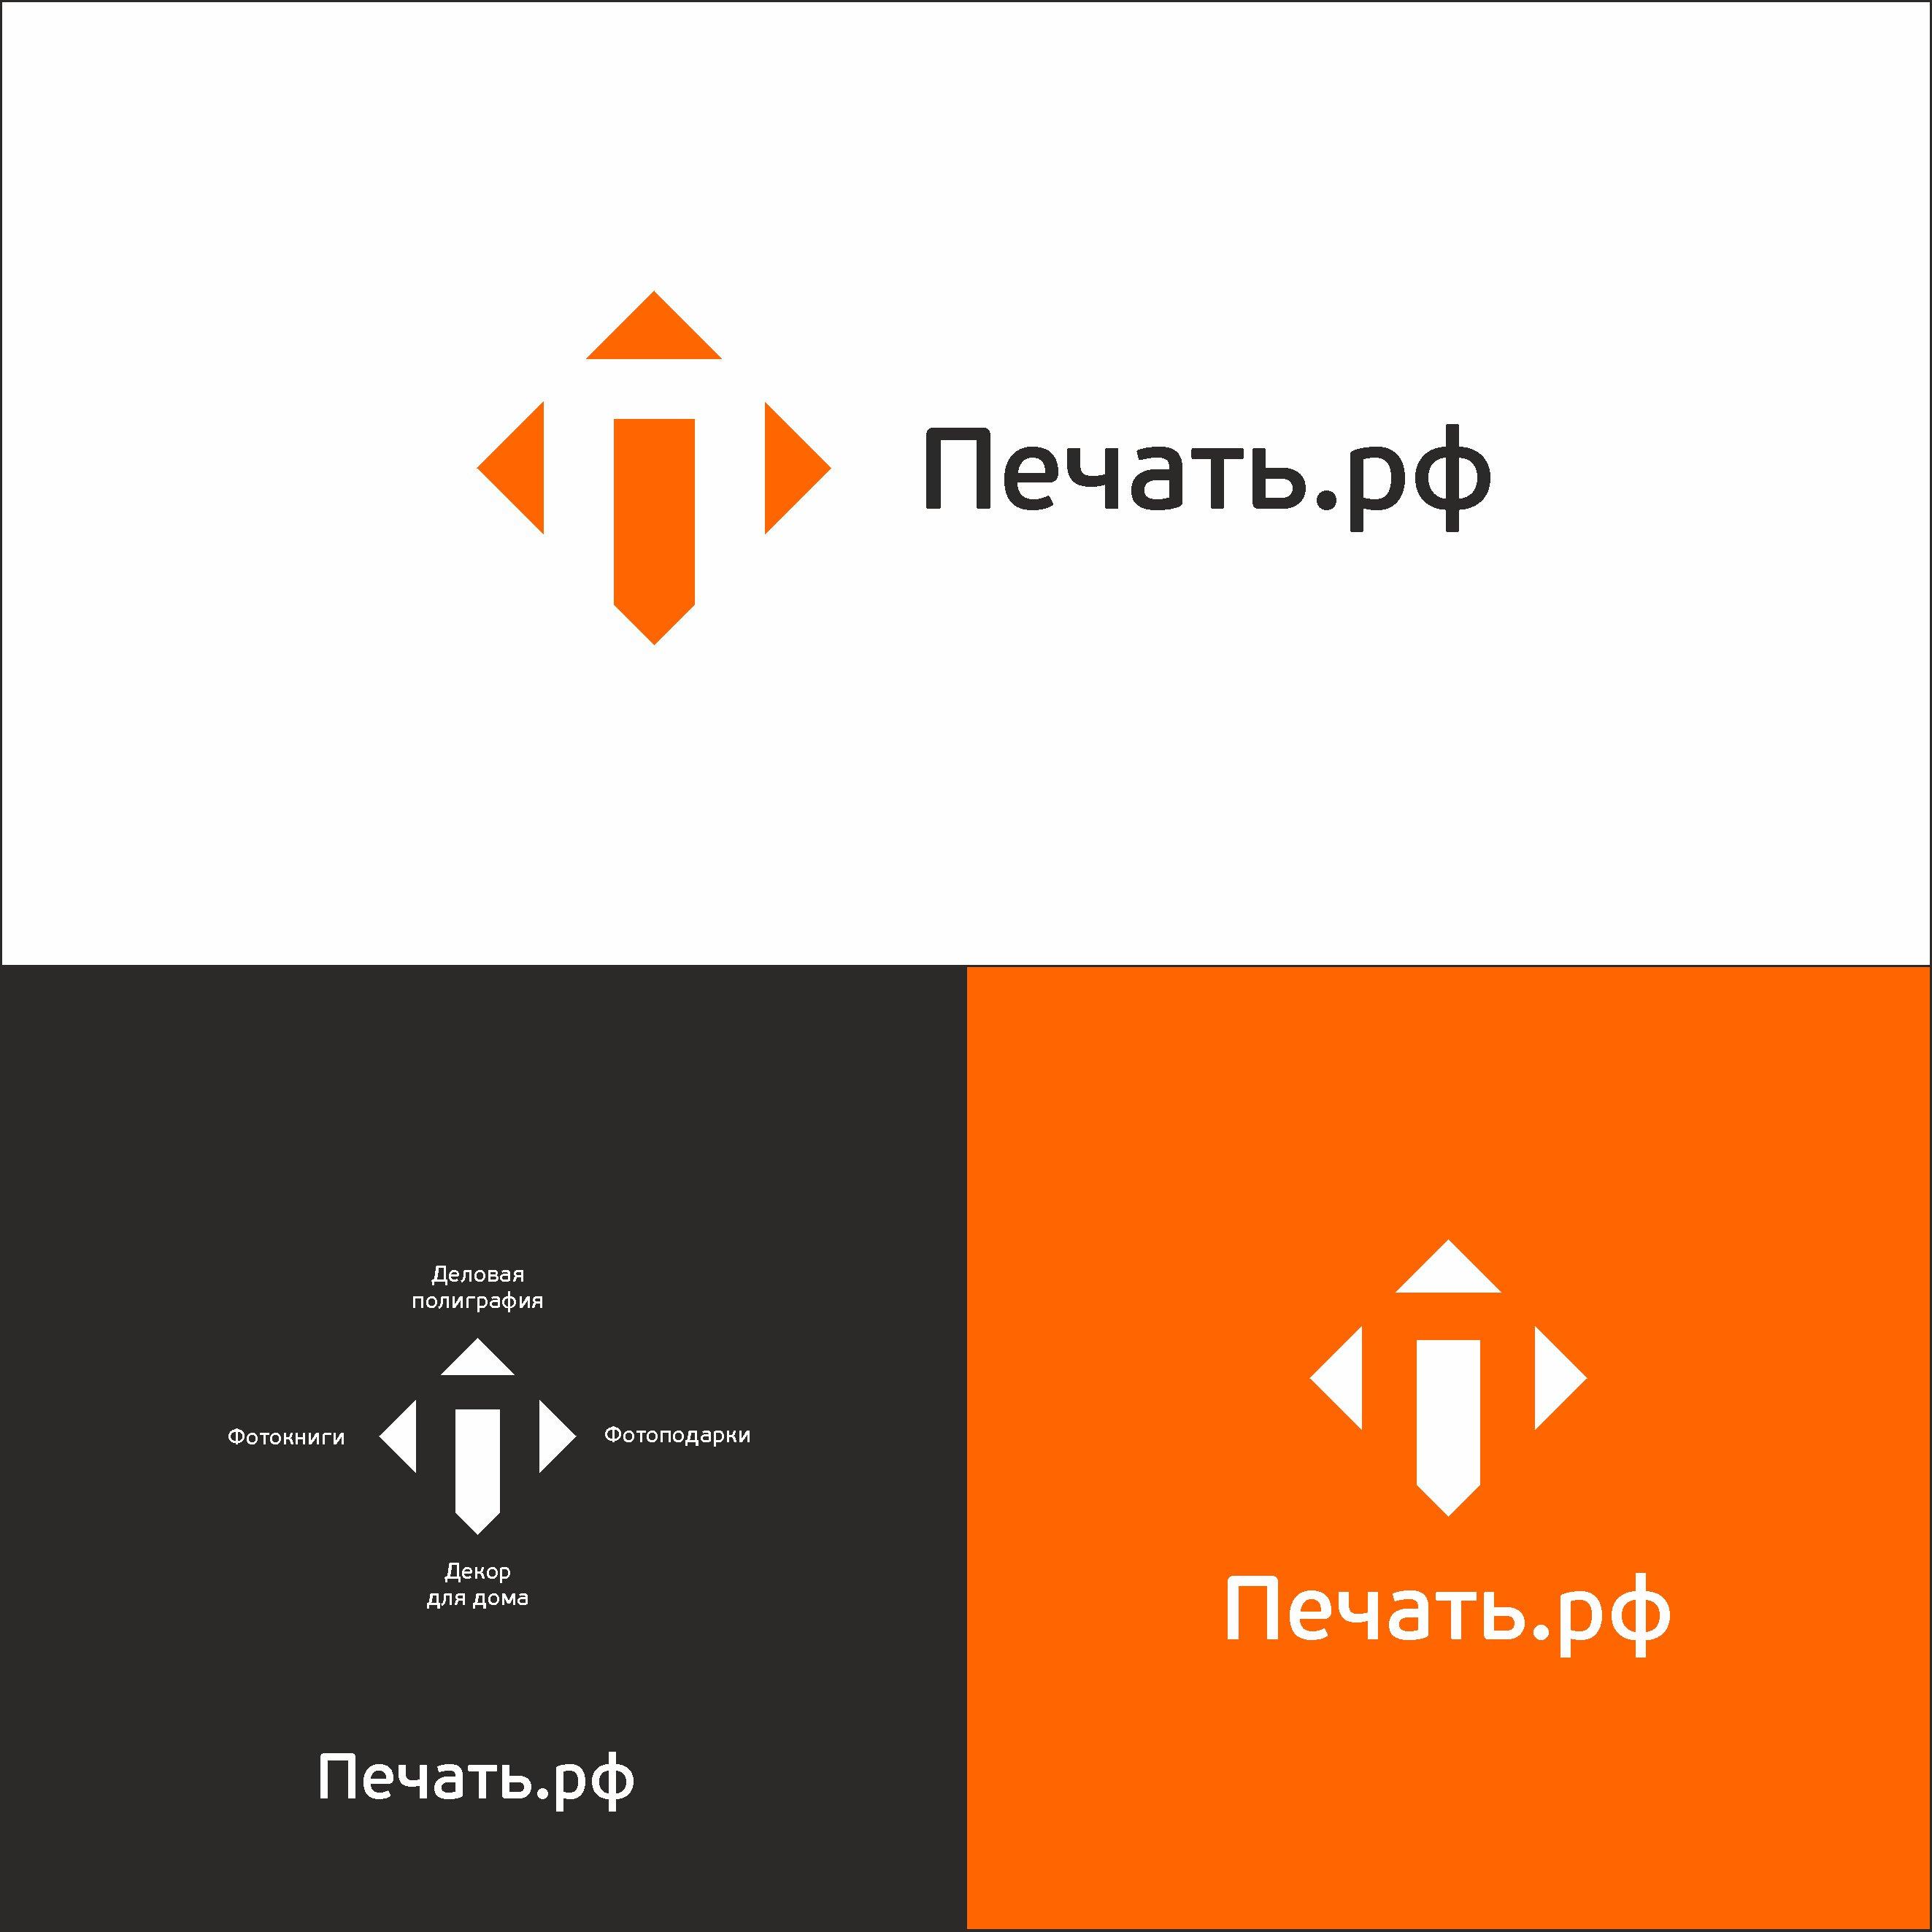 Логотип для веб-сервиса интерьерной печати и оперативной пол фото f_3195d29d1279c1e4.jpg